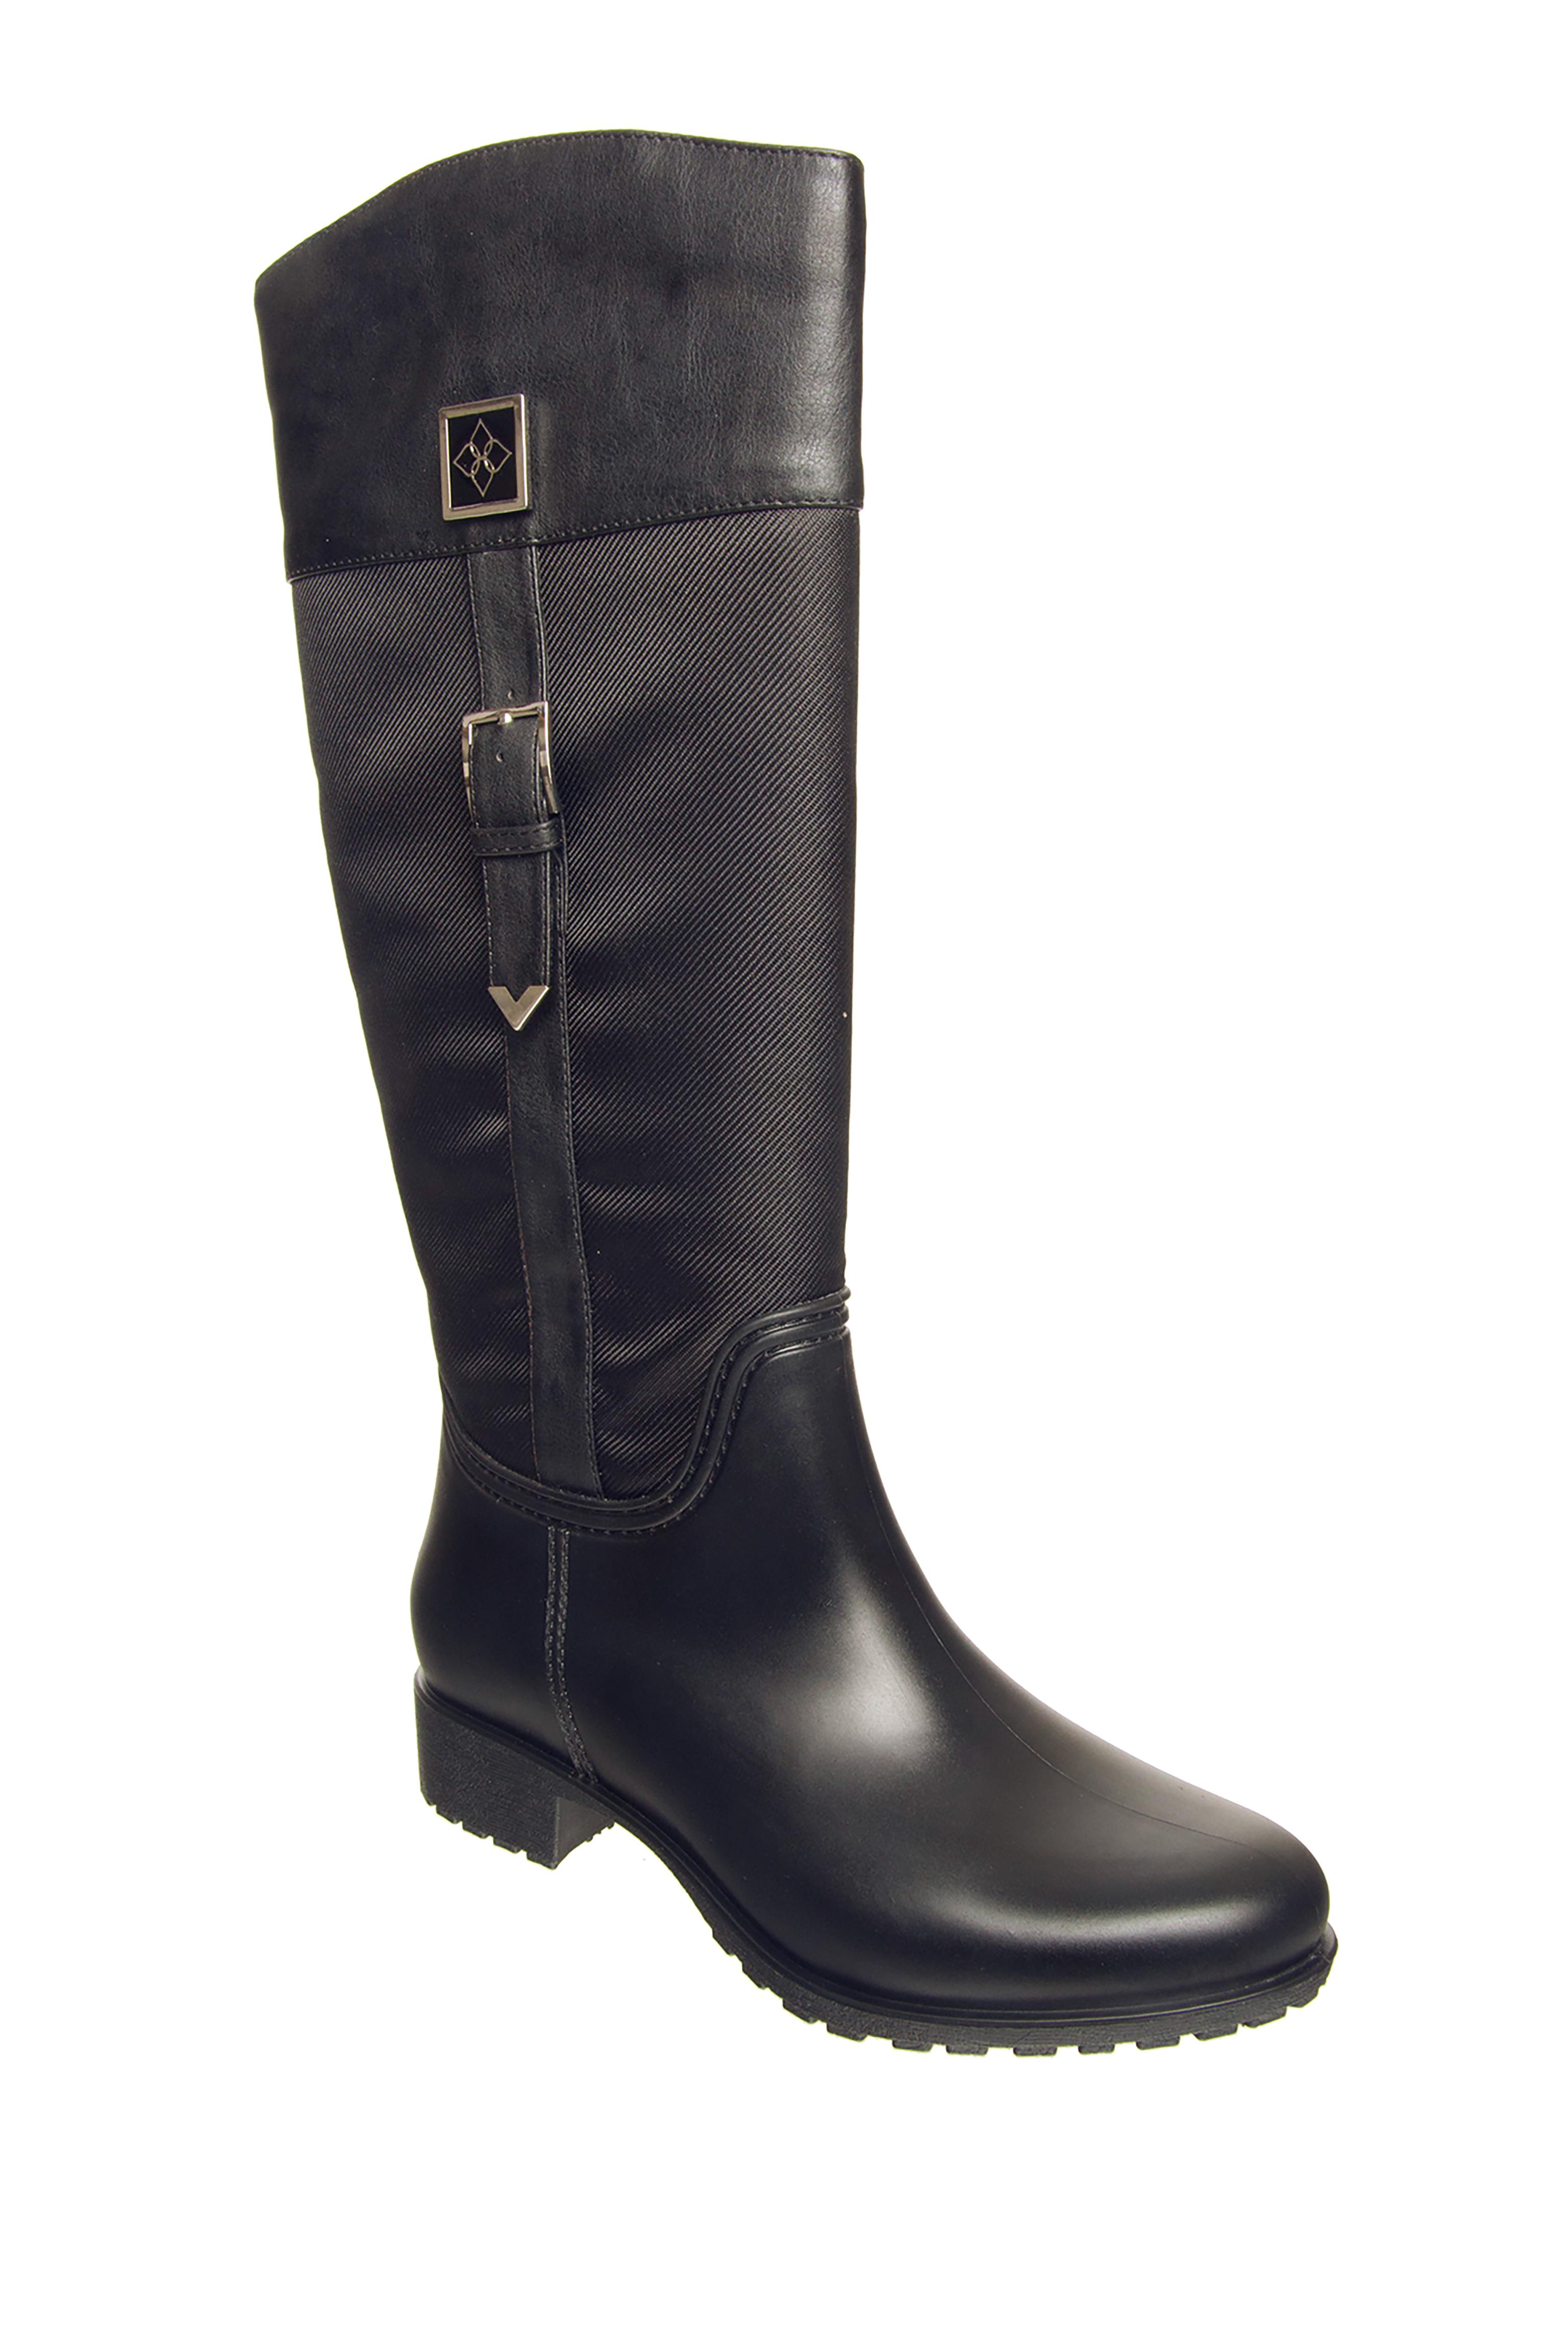 dav Coventry Nylon Mid Heel Rain Boots - Black